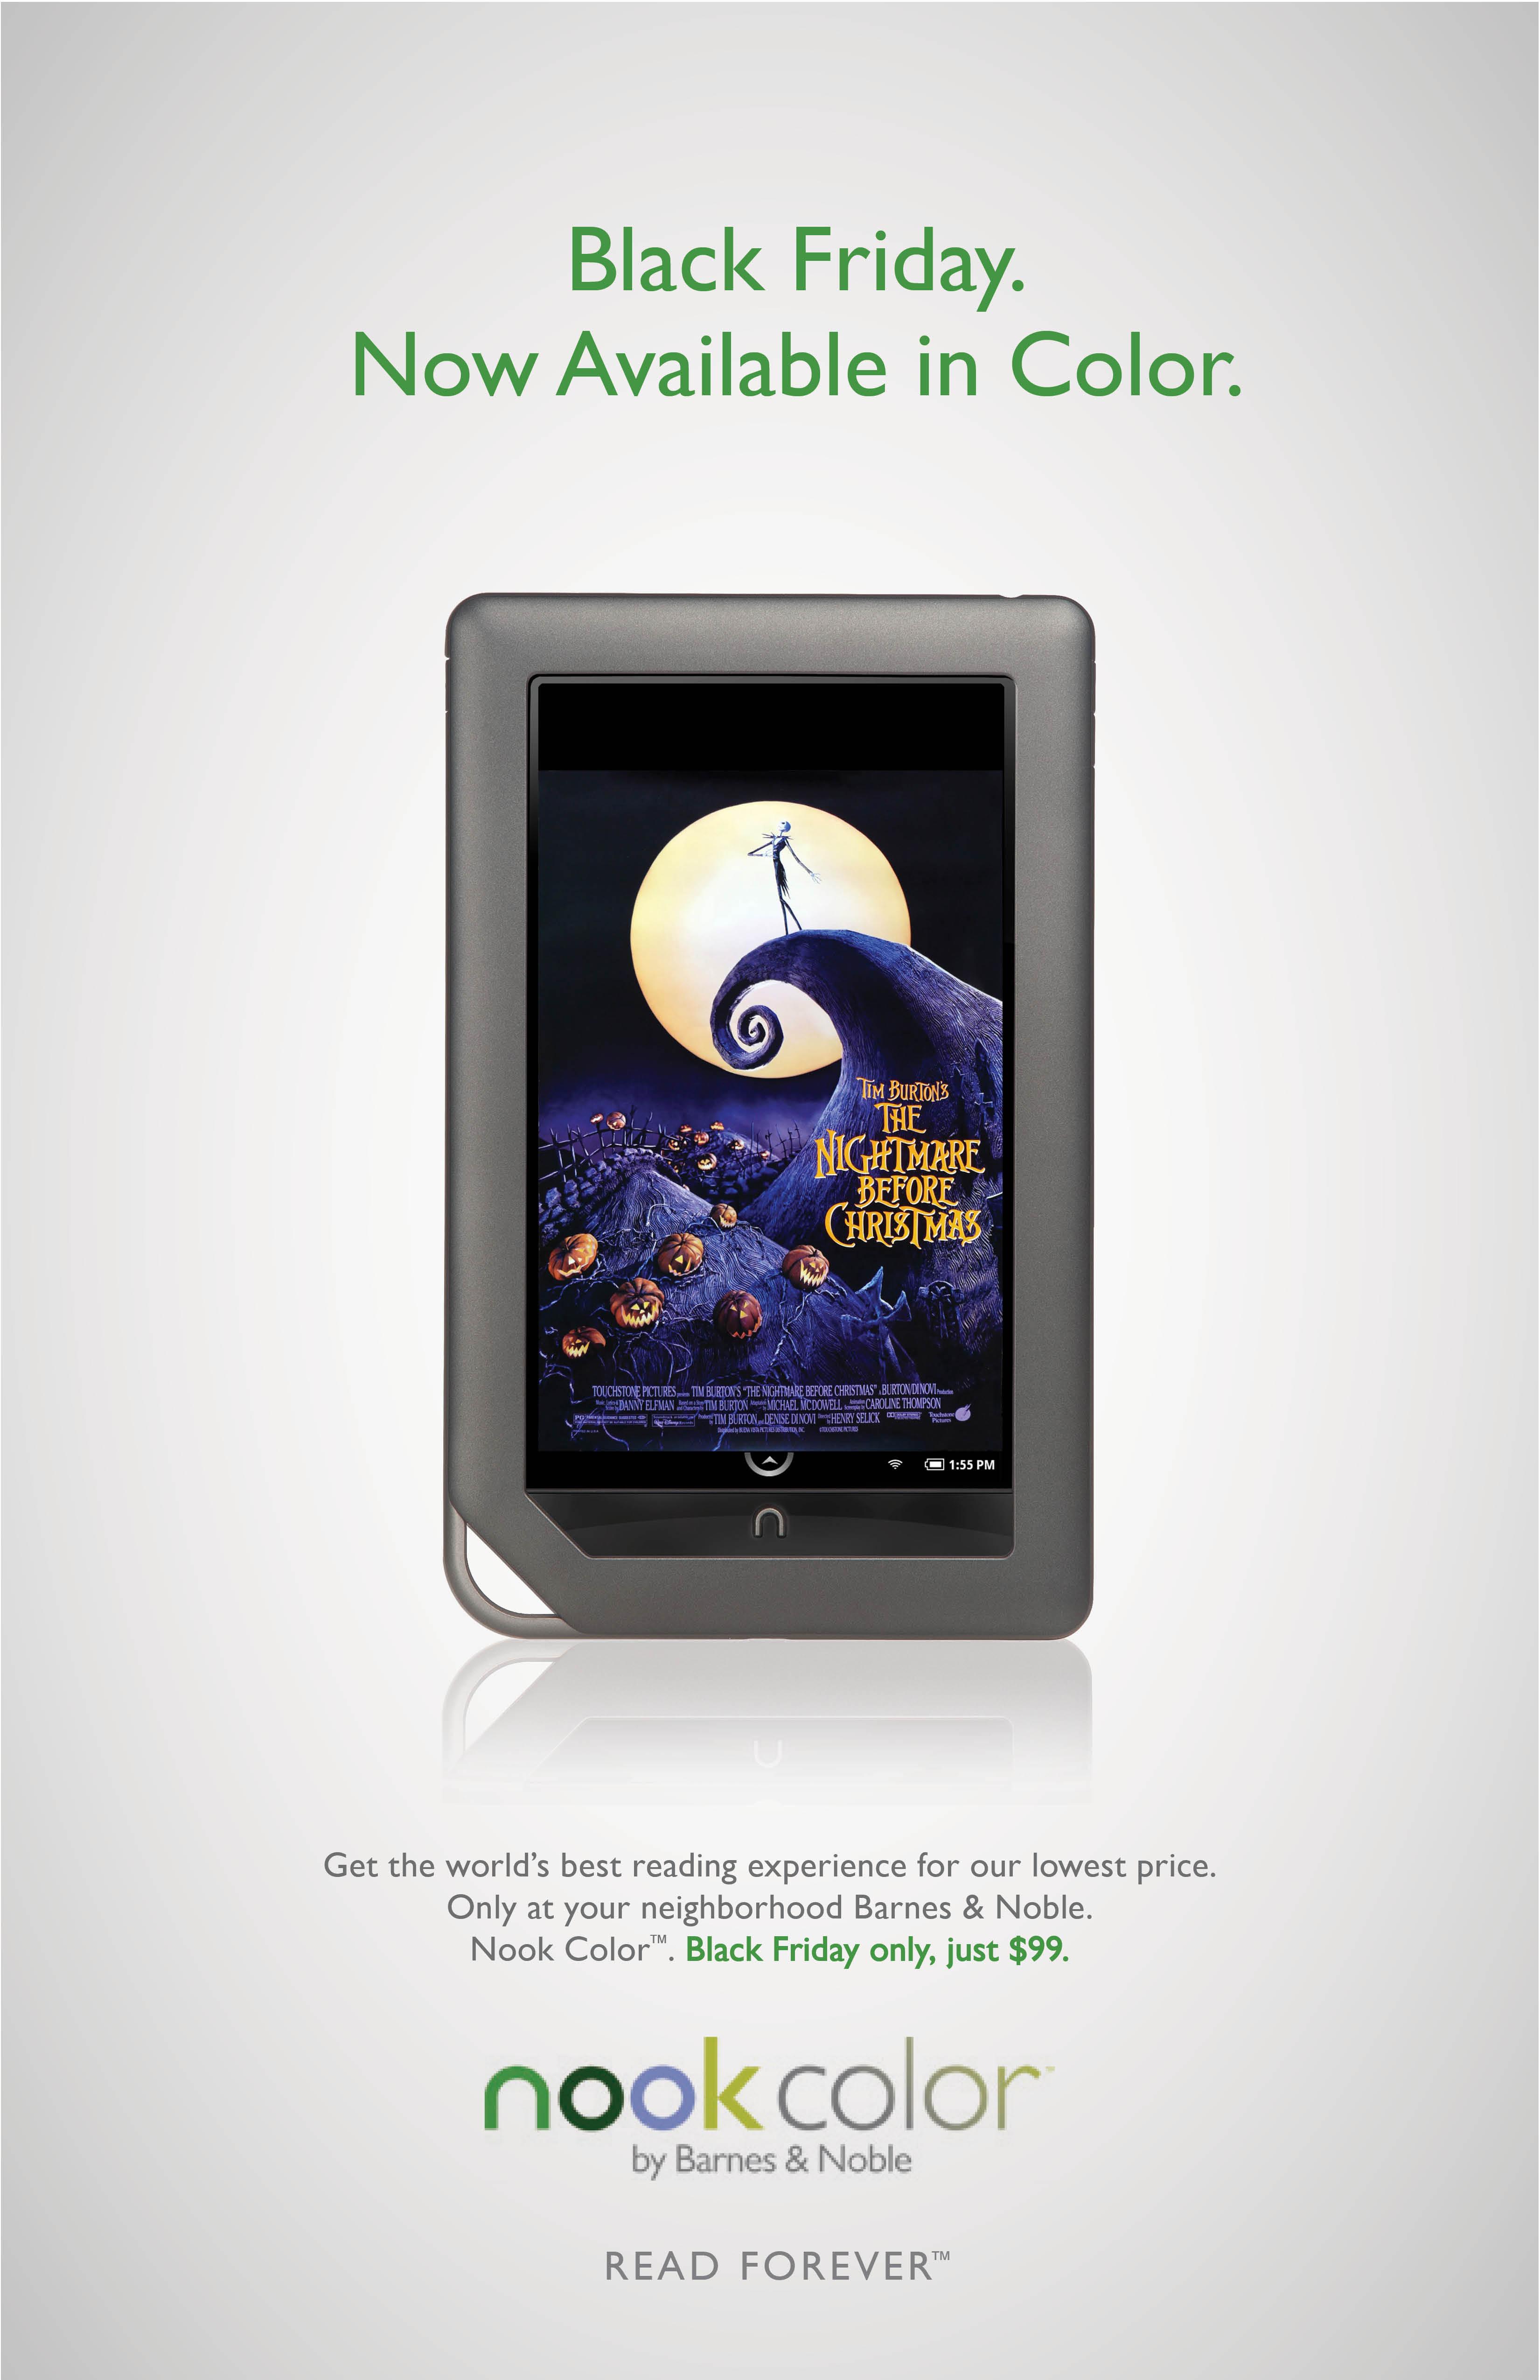 Barnes & Noble NOOK - Black Friday on Behance